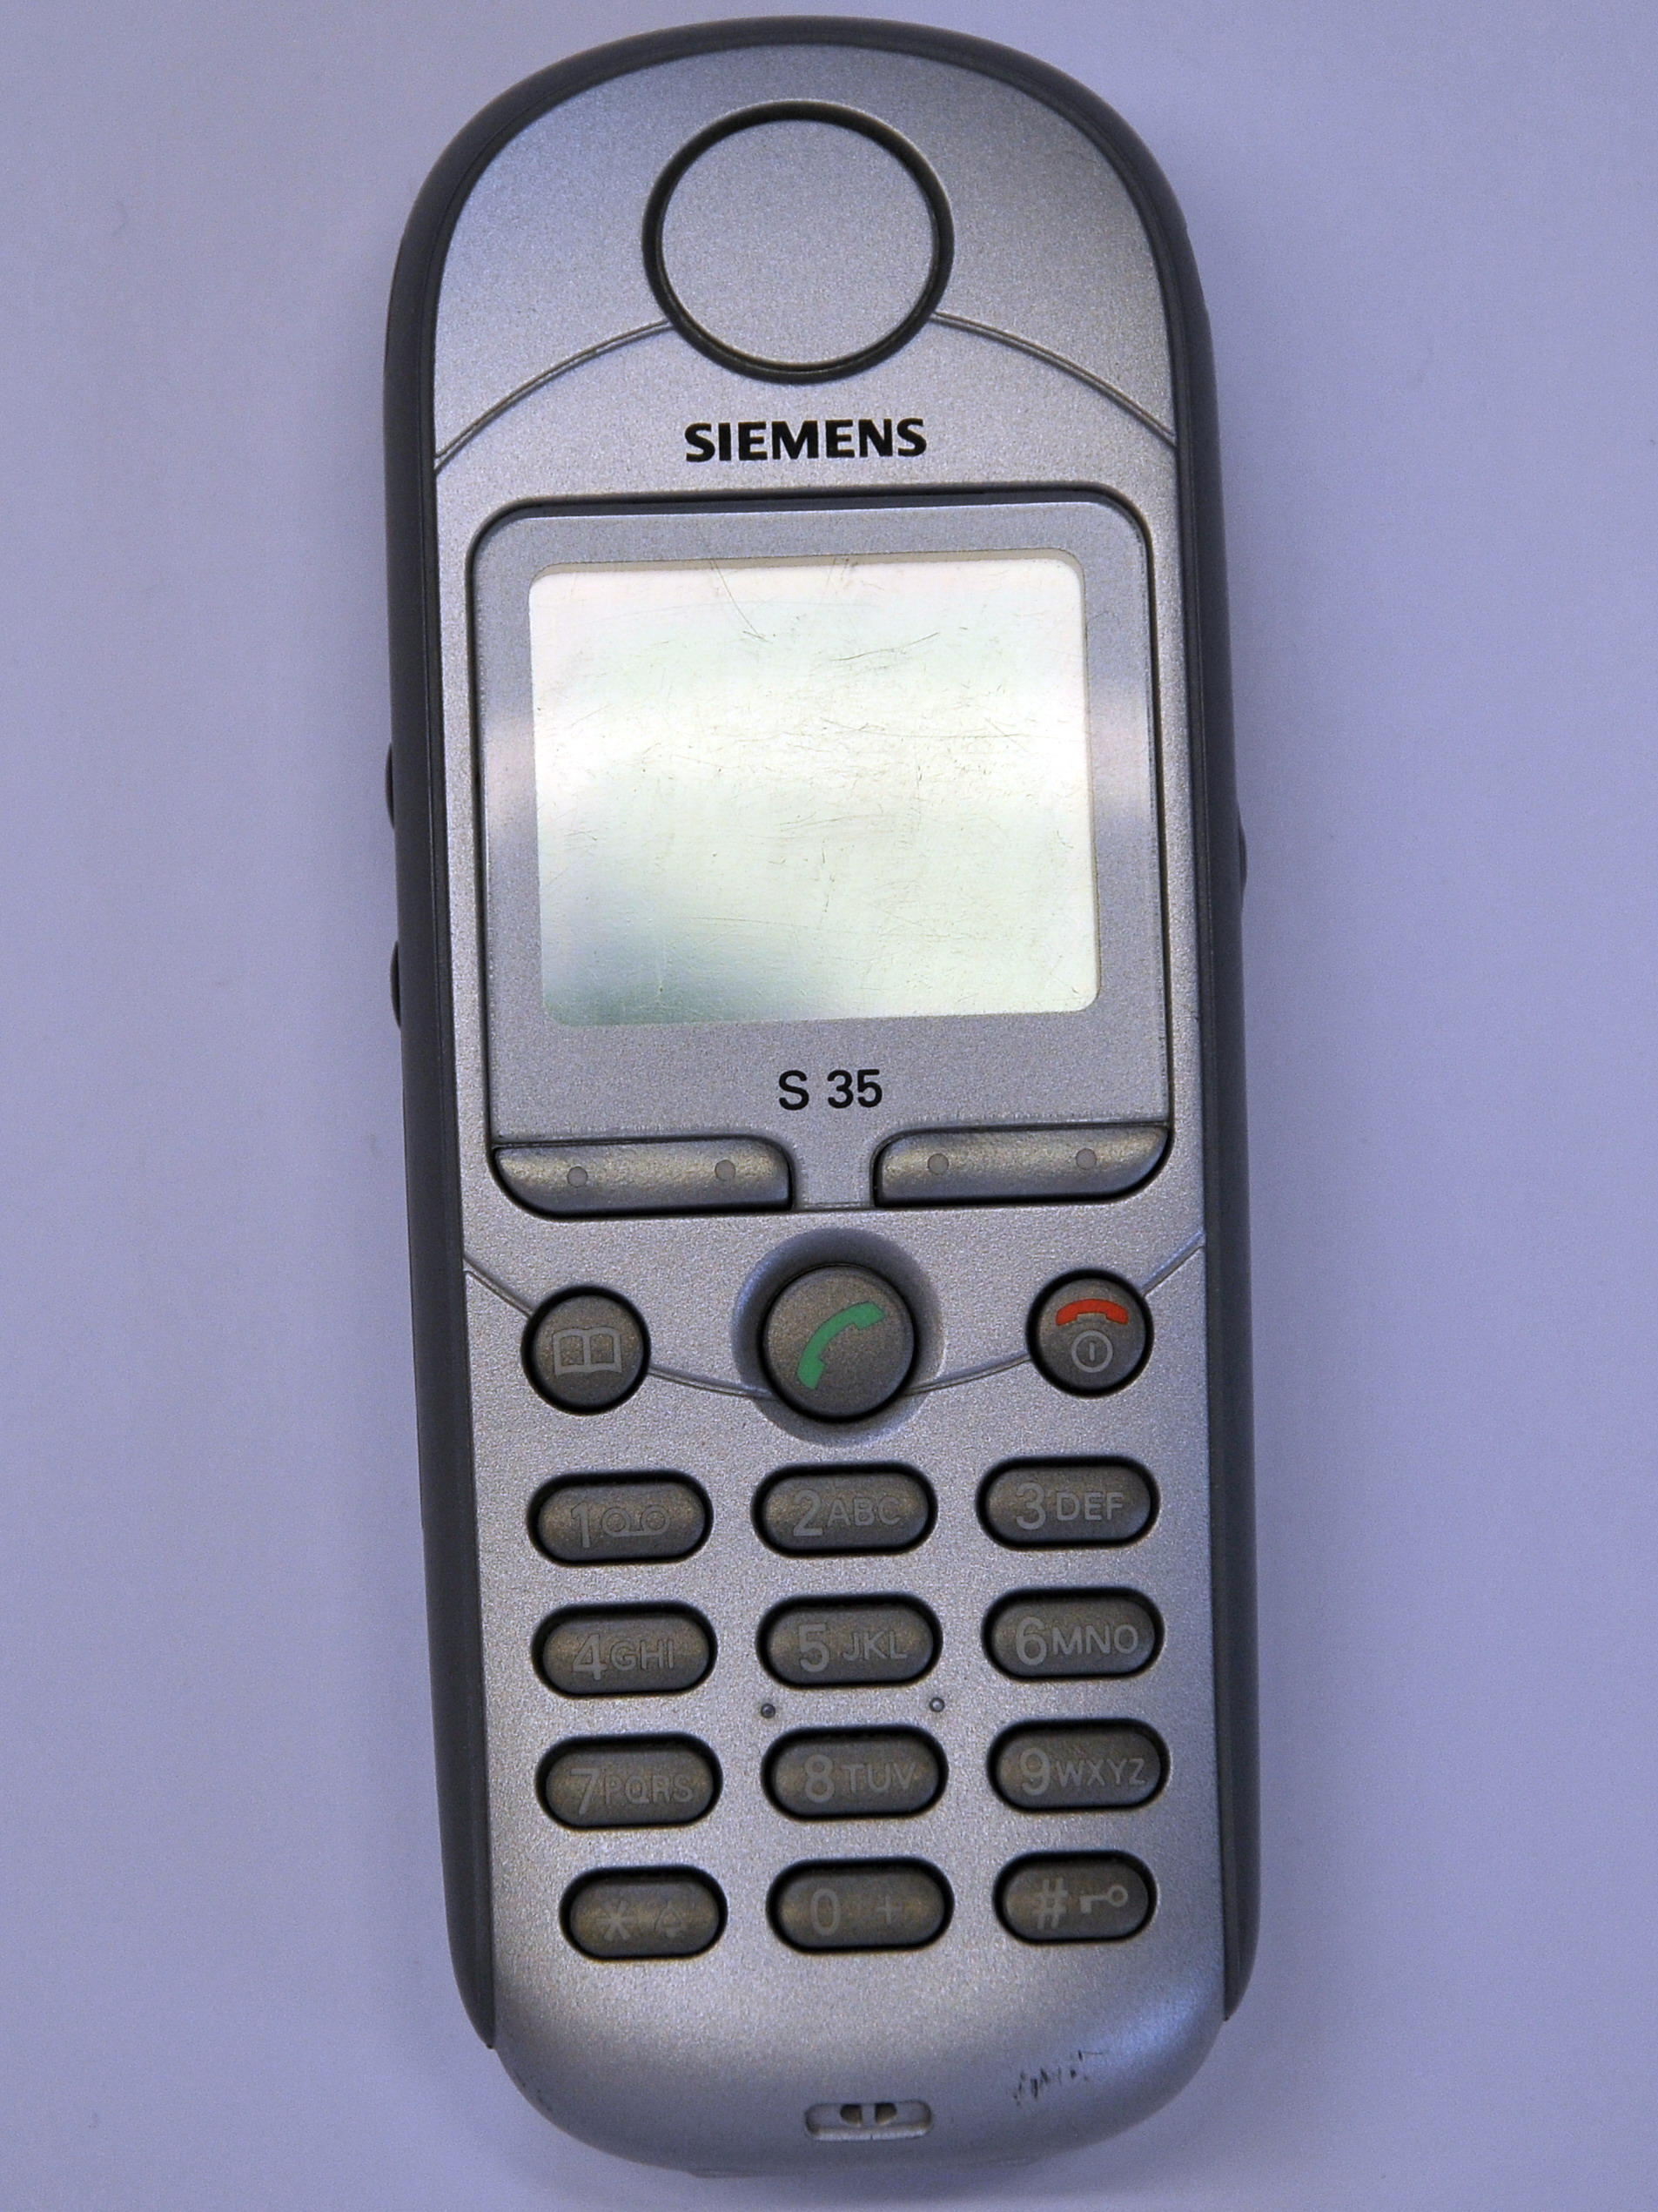 Microguard handy-fernbedienung bmw standheizung e60 + siemens s35.